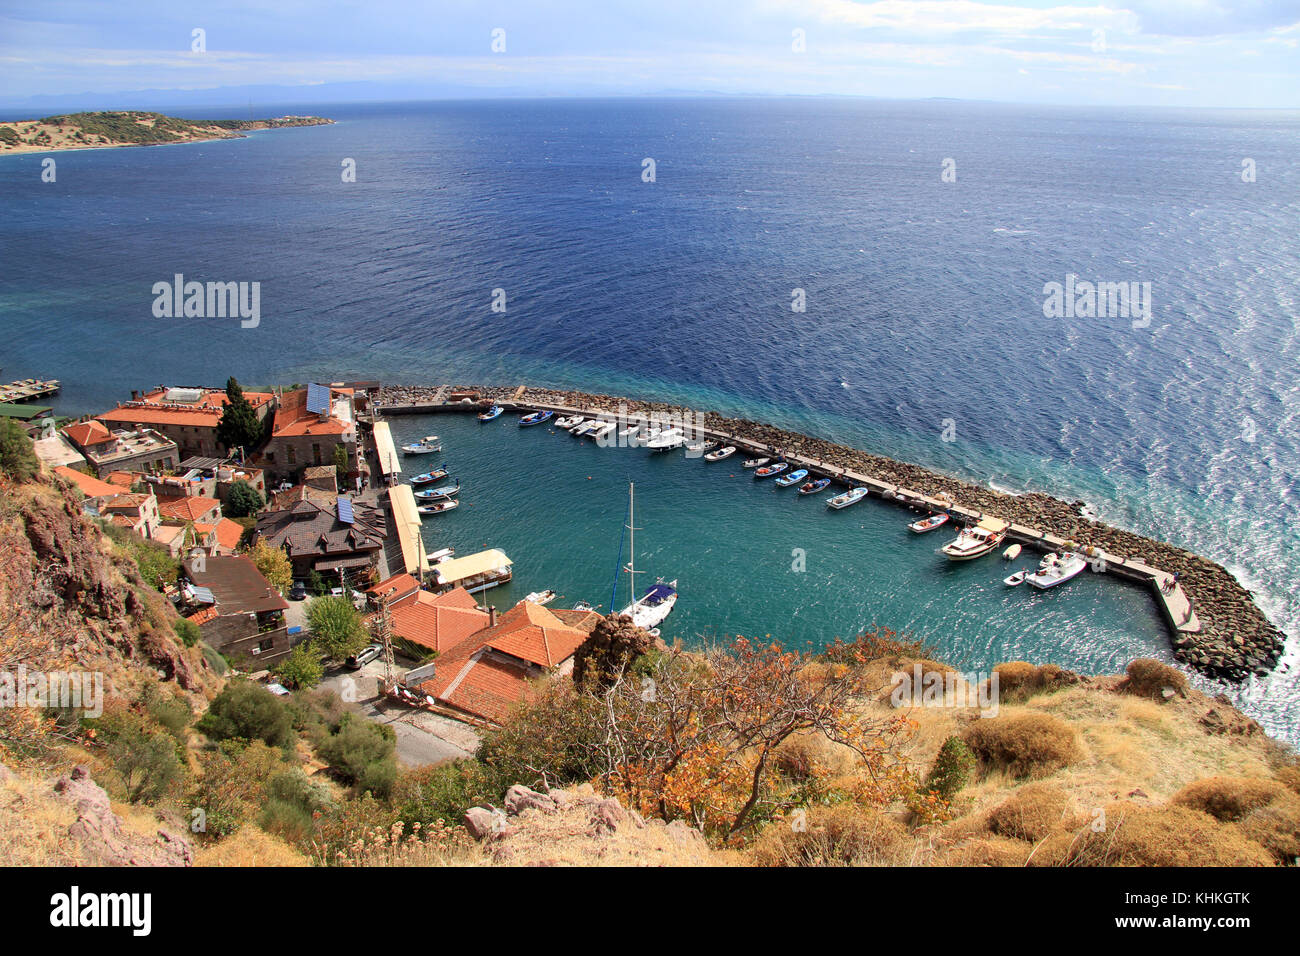 Old port Iskele near ancient Assos in Behramkale, Turkey - Stock Image